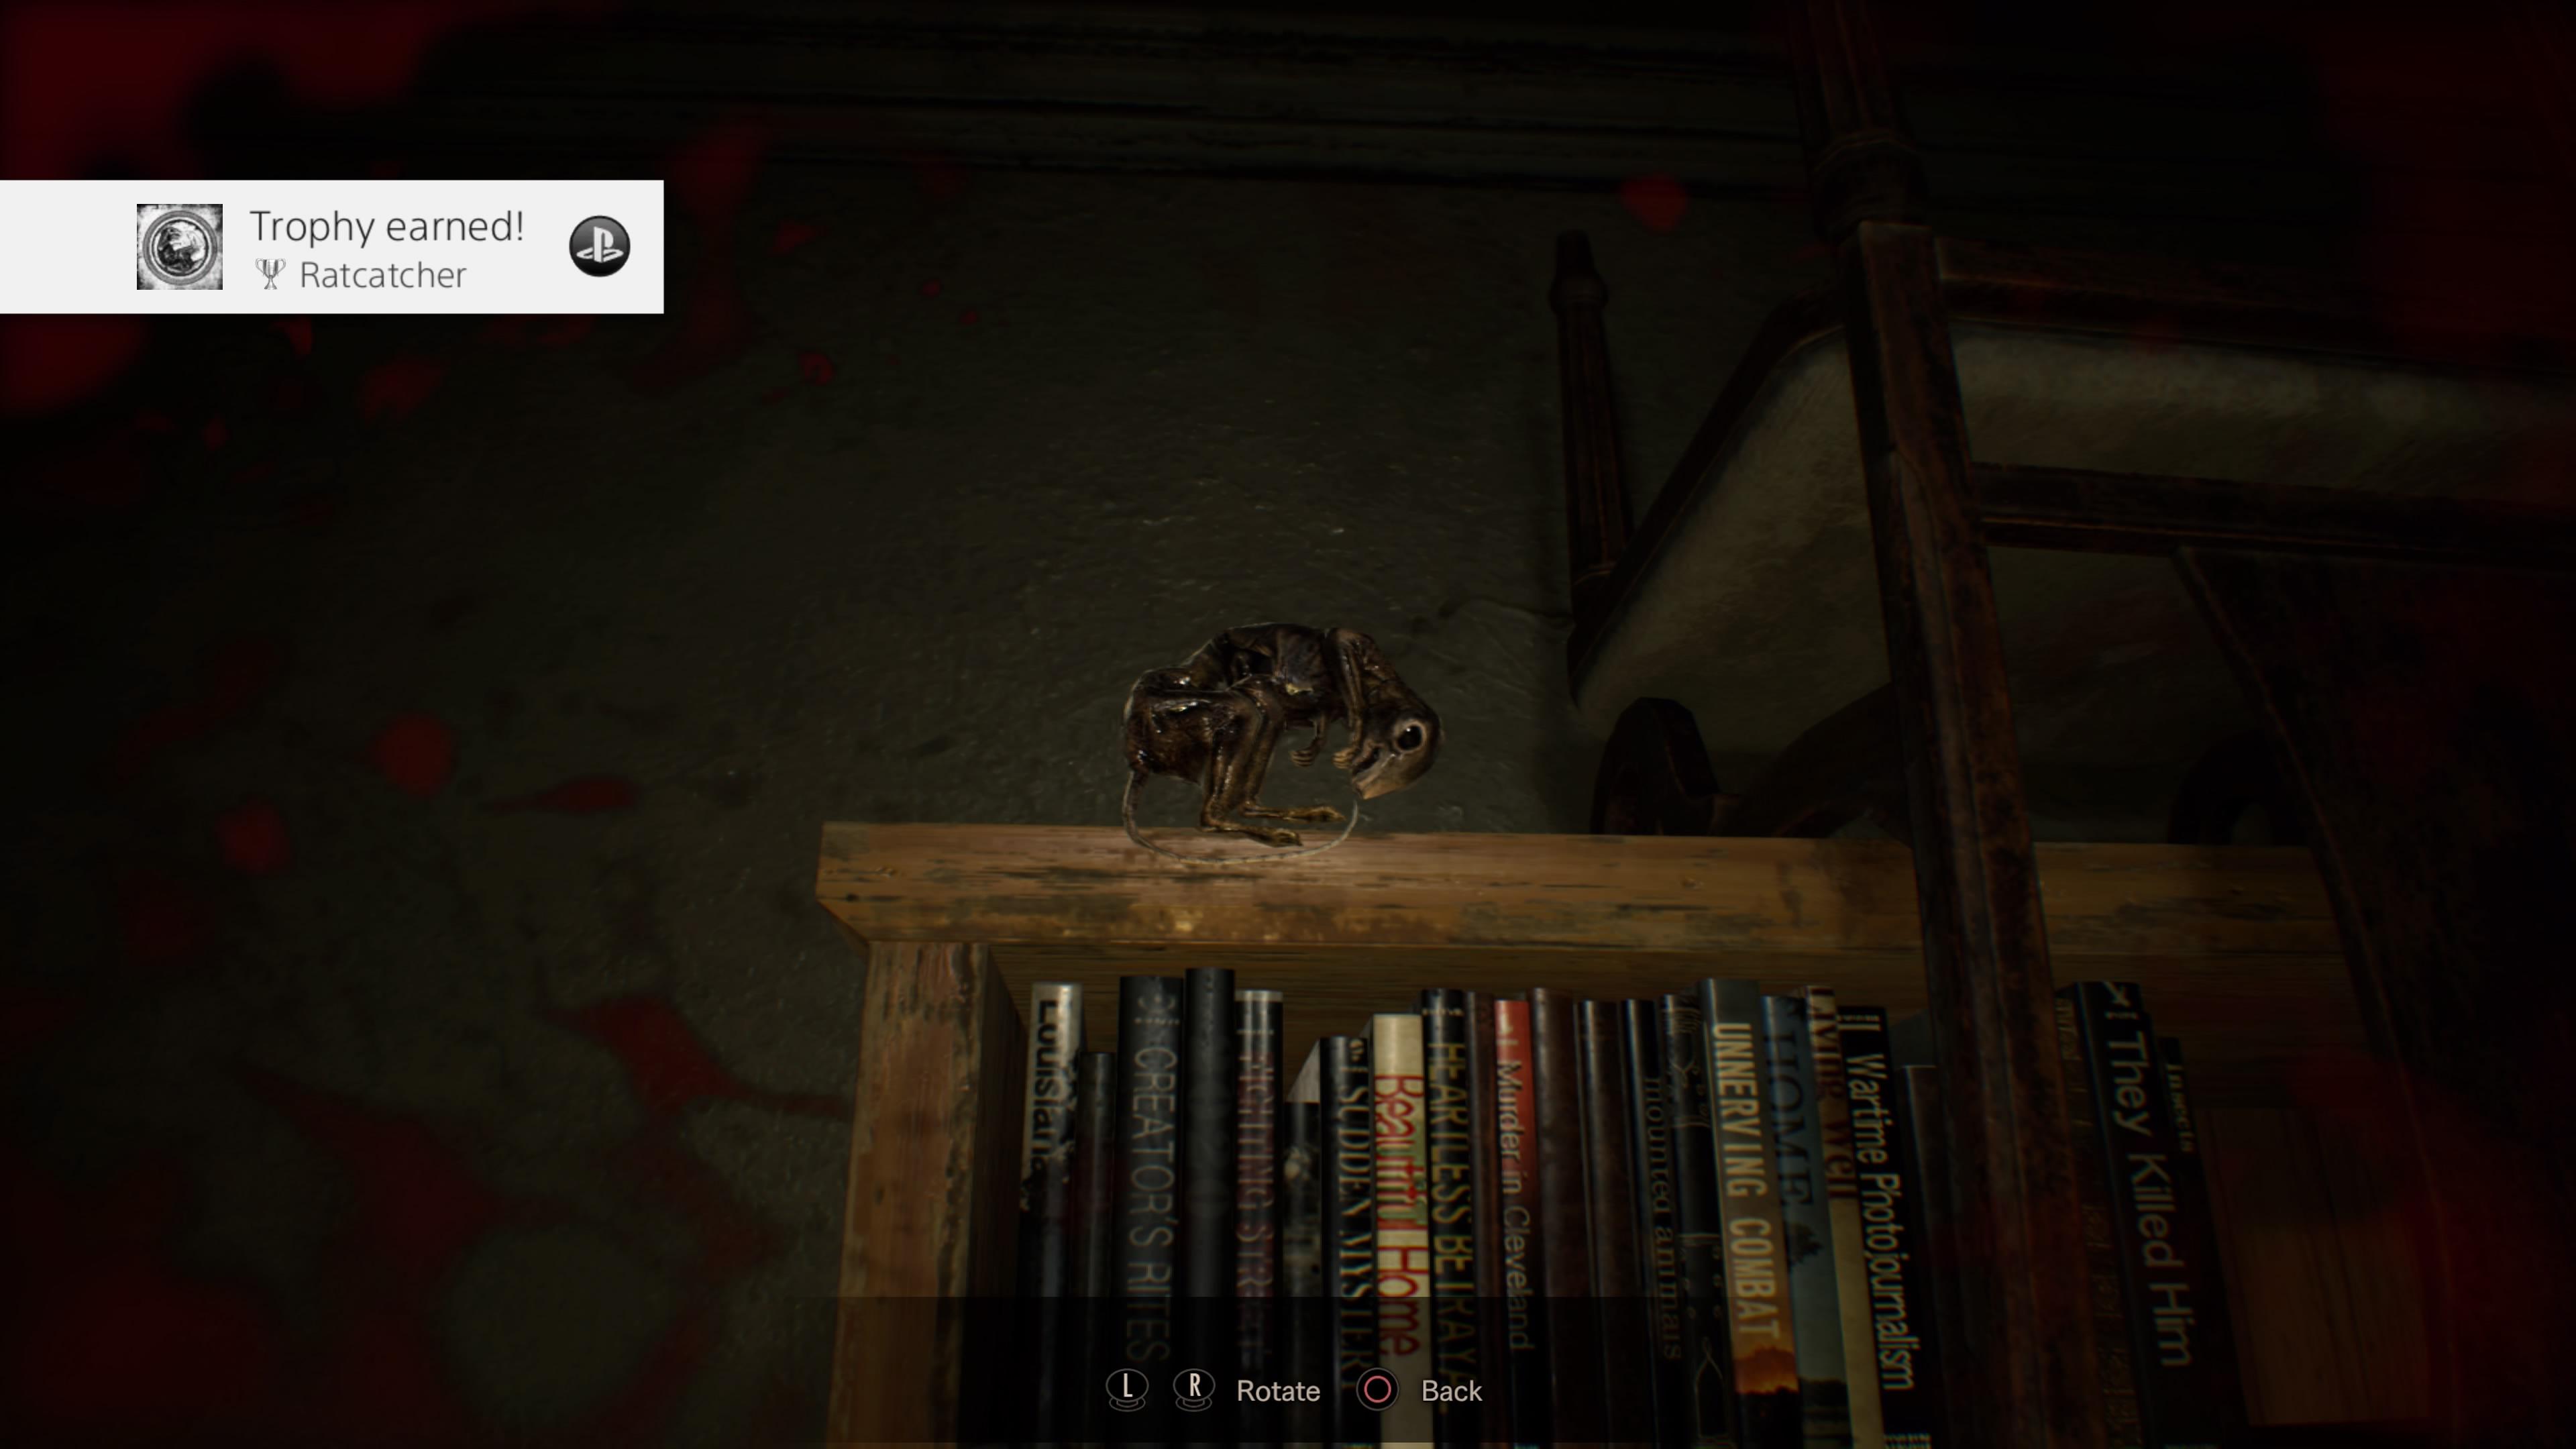 Resident Evil 7 Bedroom Dlc Acquiring The Ratcatcher Trophy Achievement Just Push Start